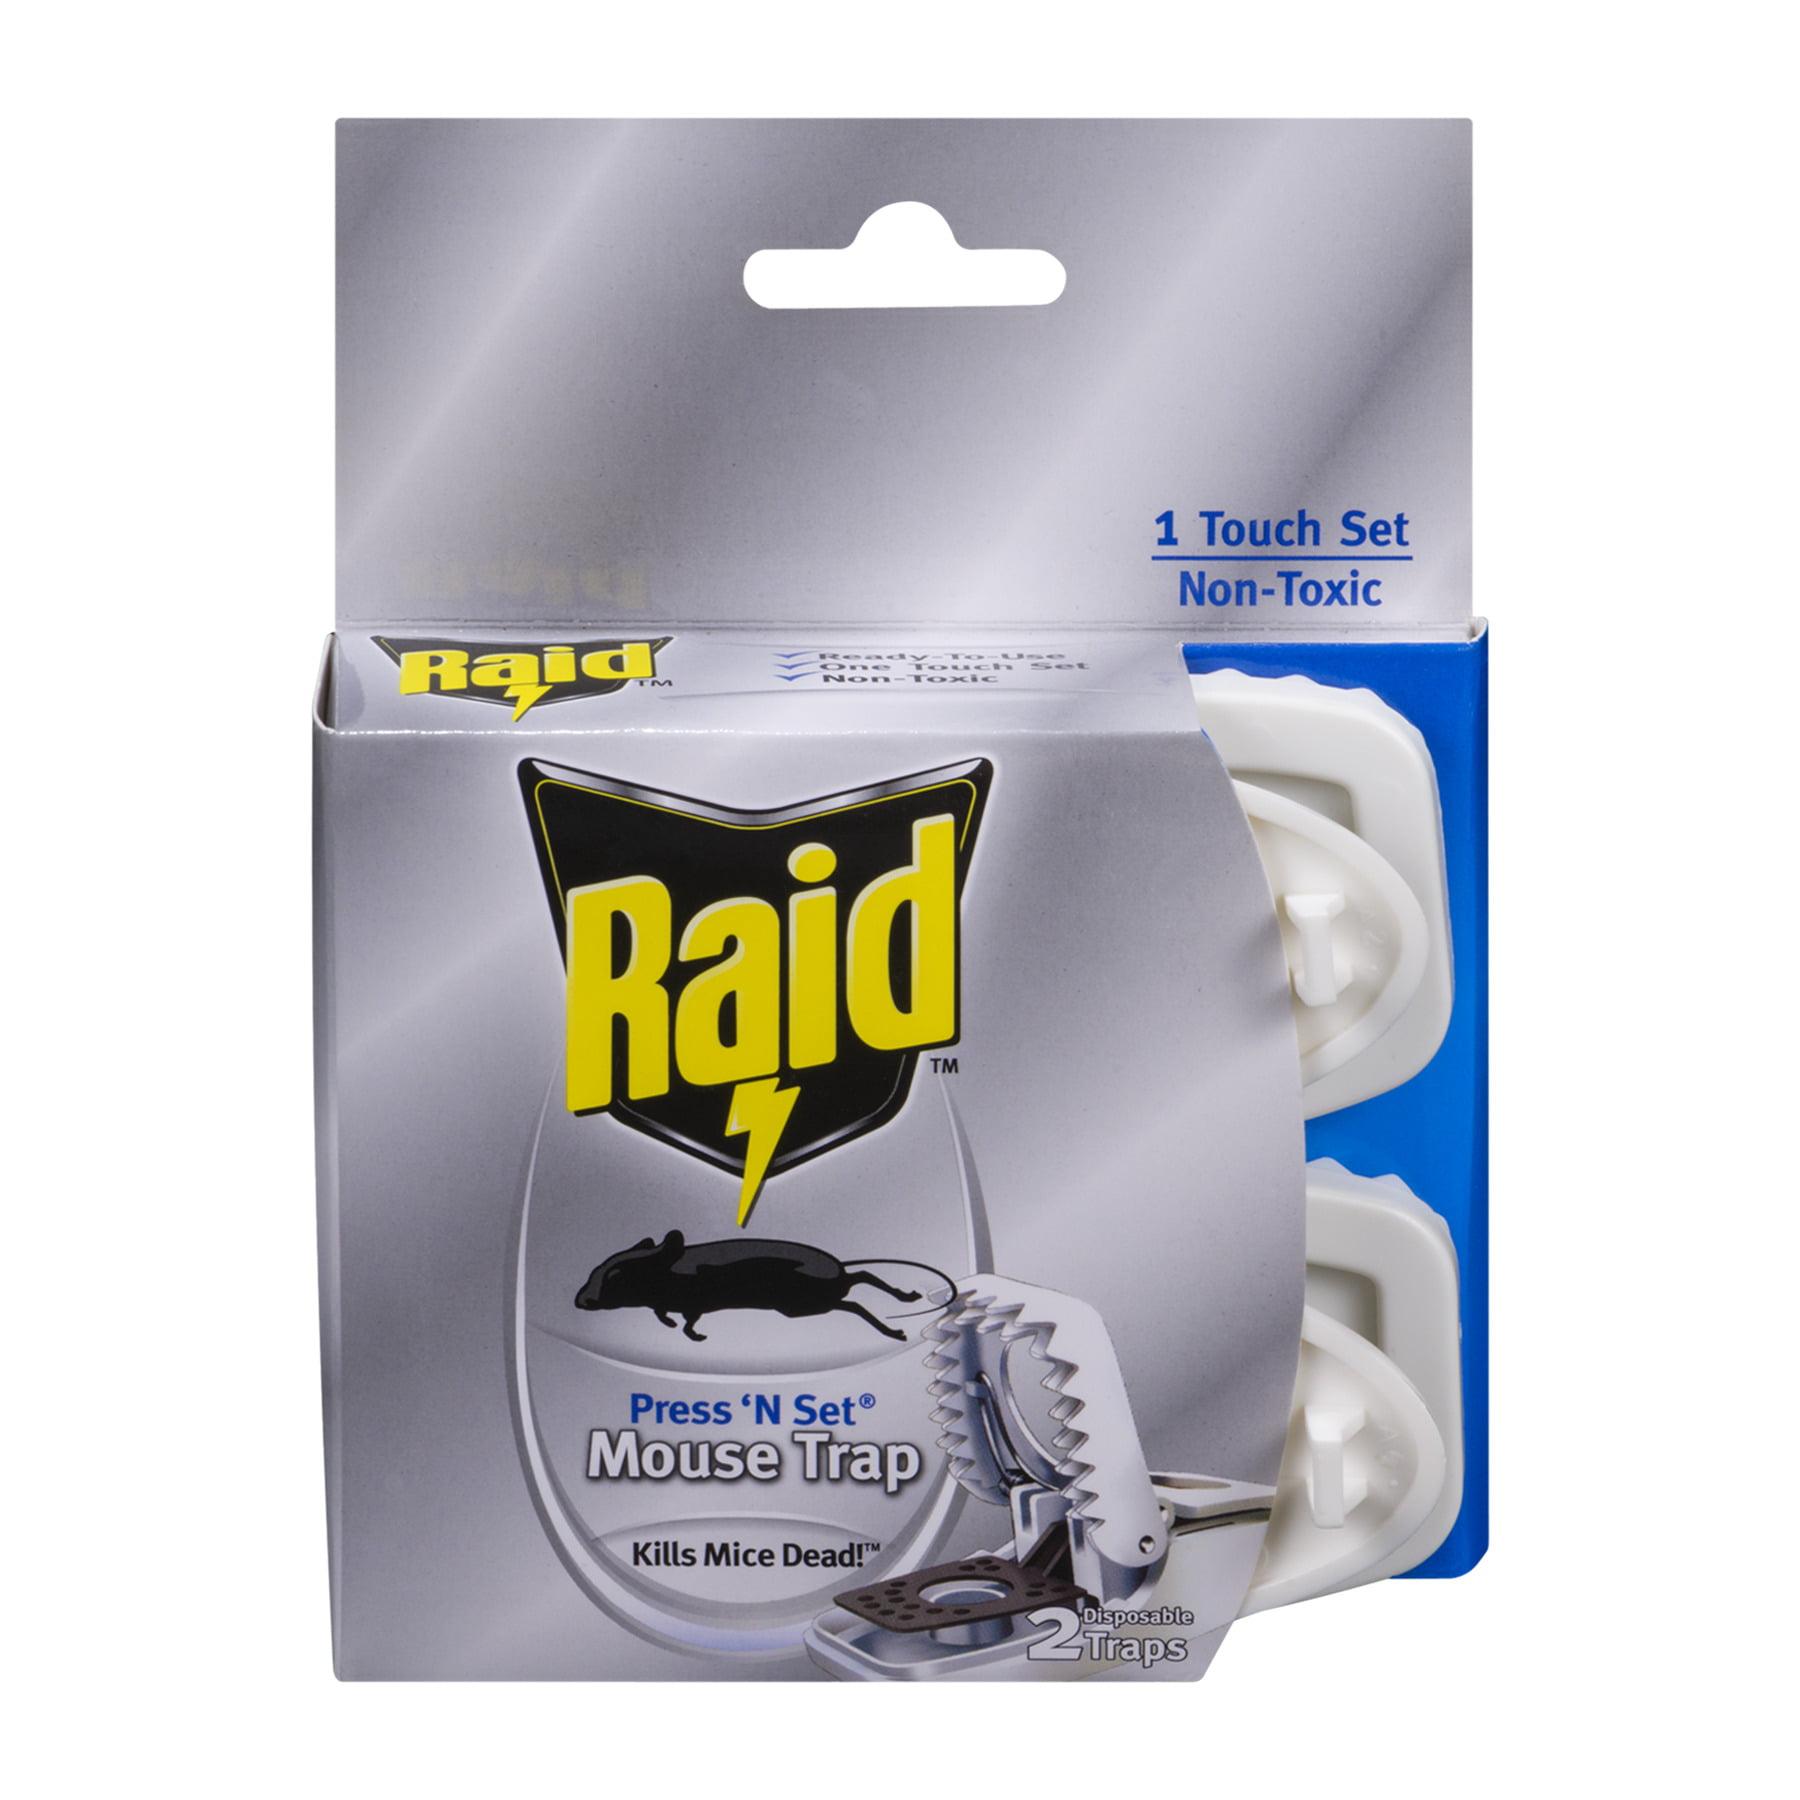 Raid Mouse Trap Press 'N Set Disposable - 2 CT2.0 CT